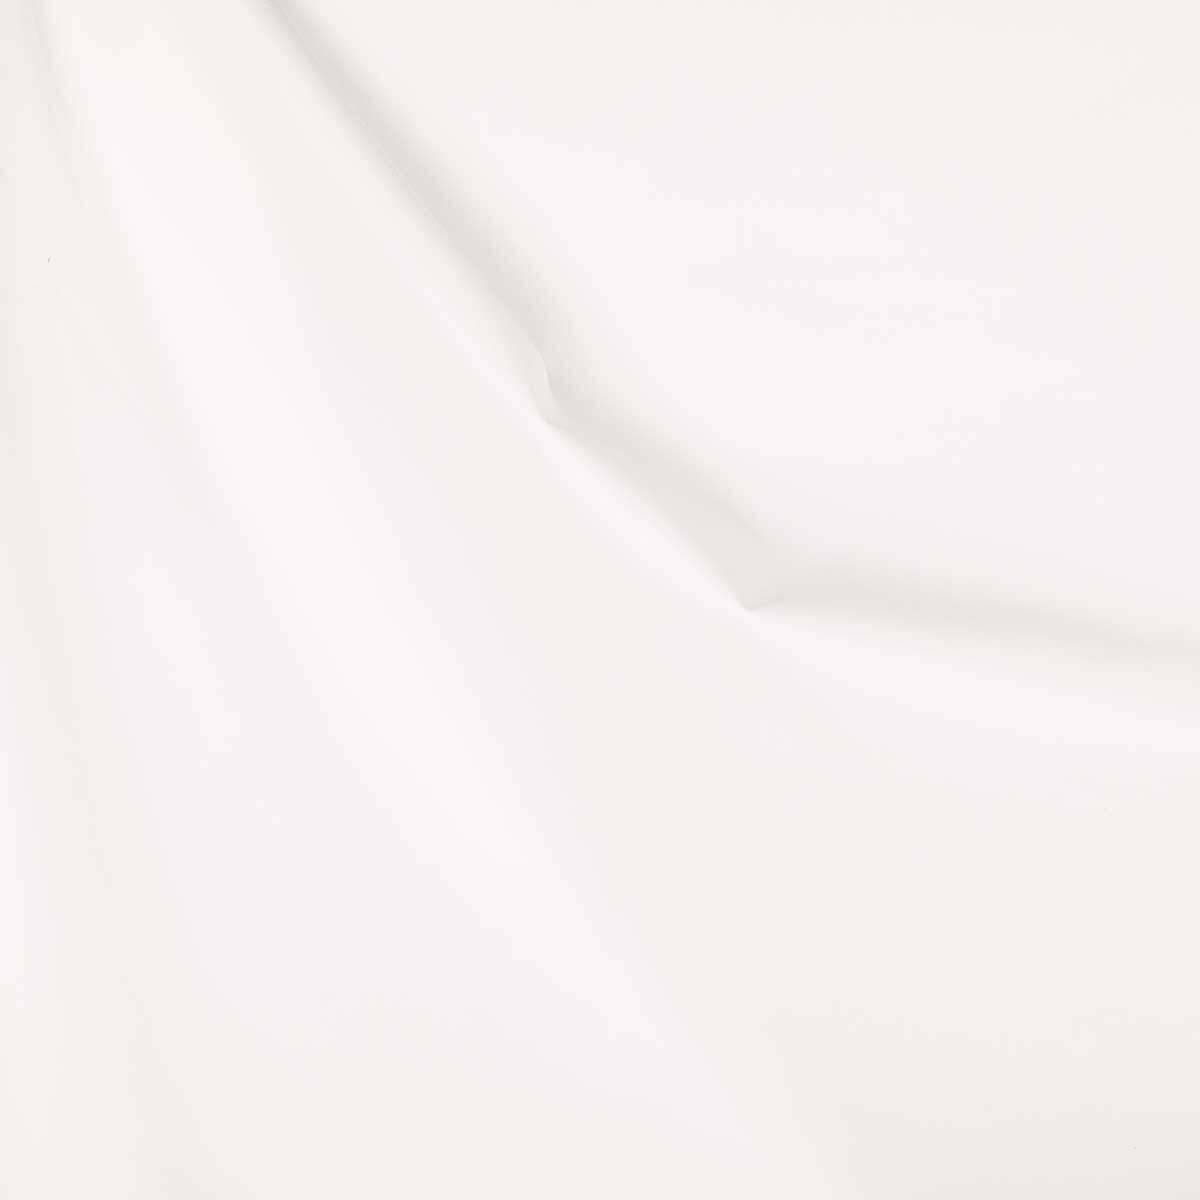 tissu occultant pour rideaux blanc